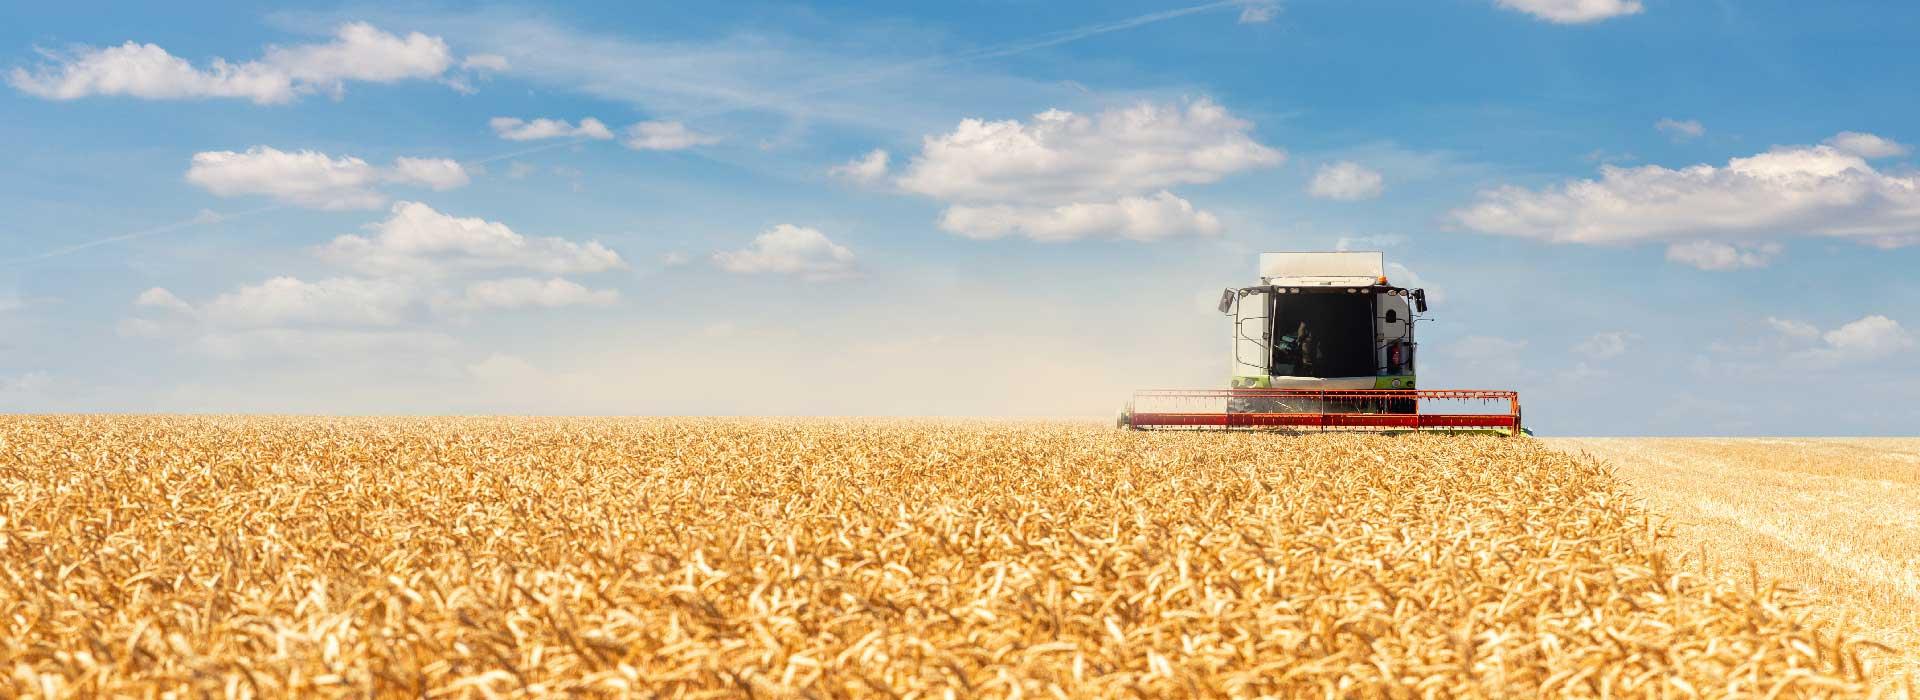 agroalimentario-FI-Group